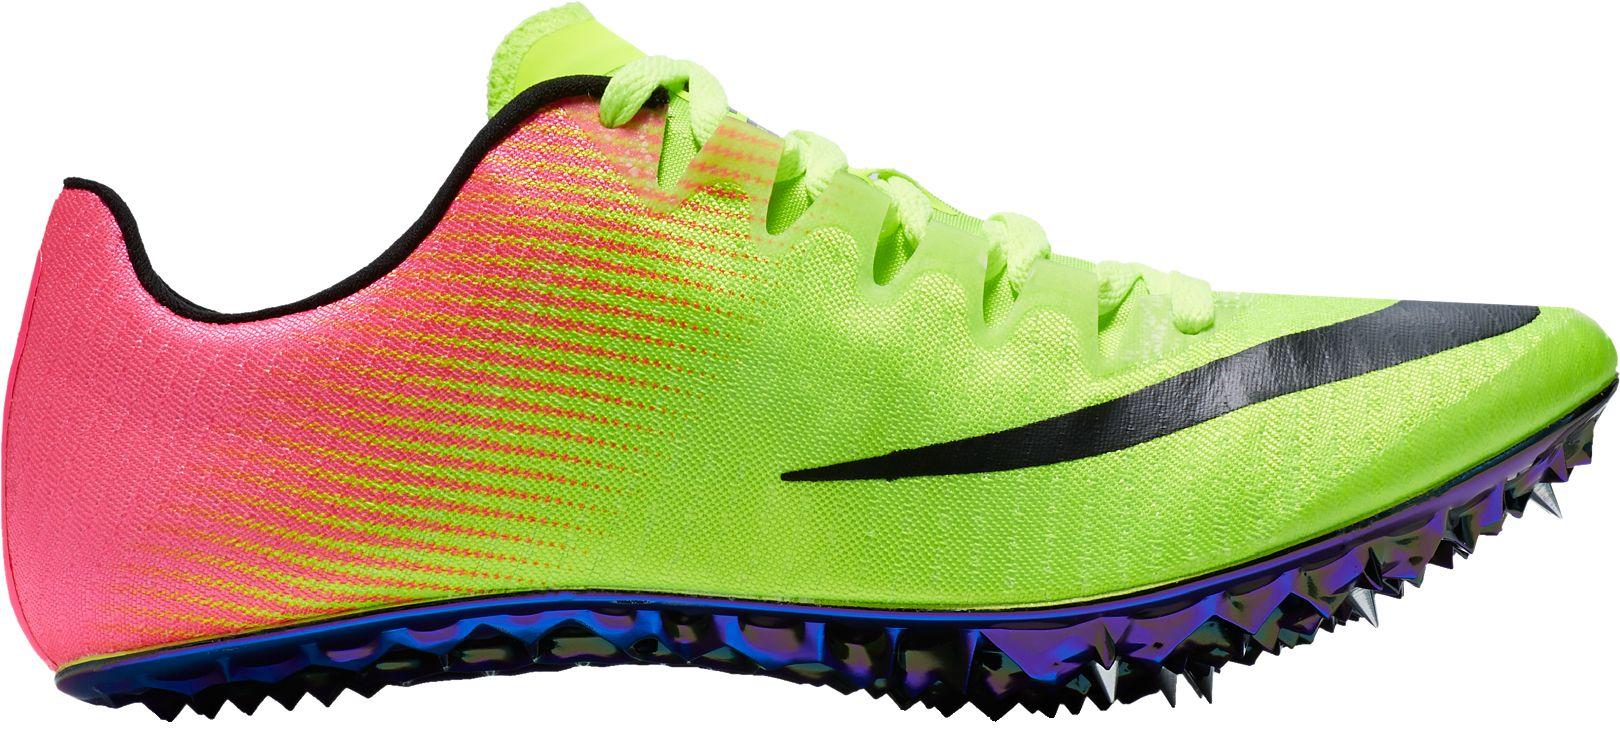 Nike Superfly Elite Spikes